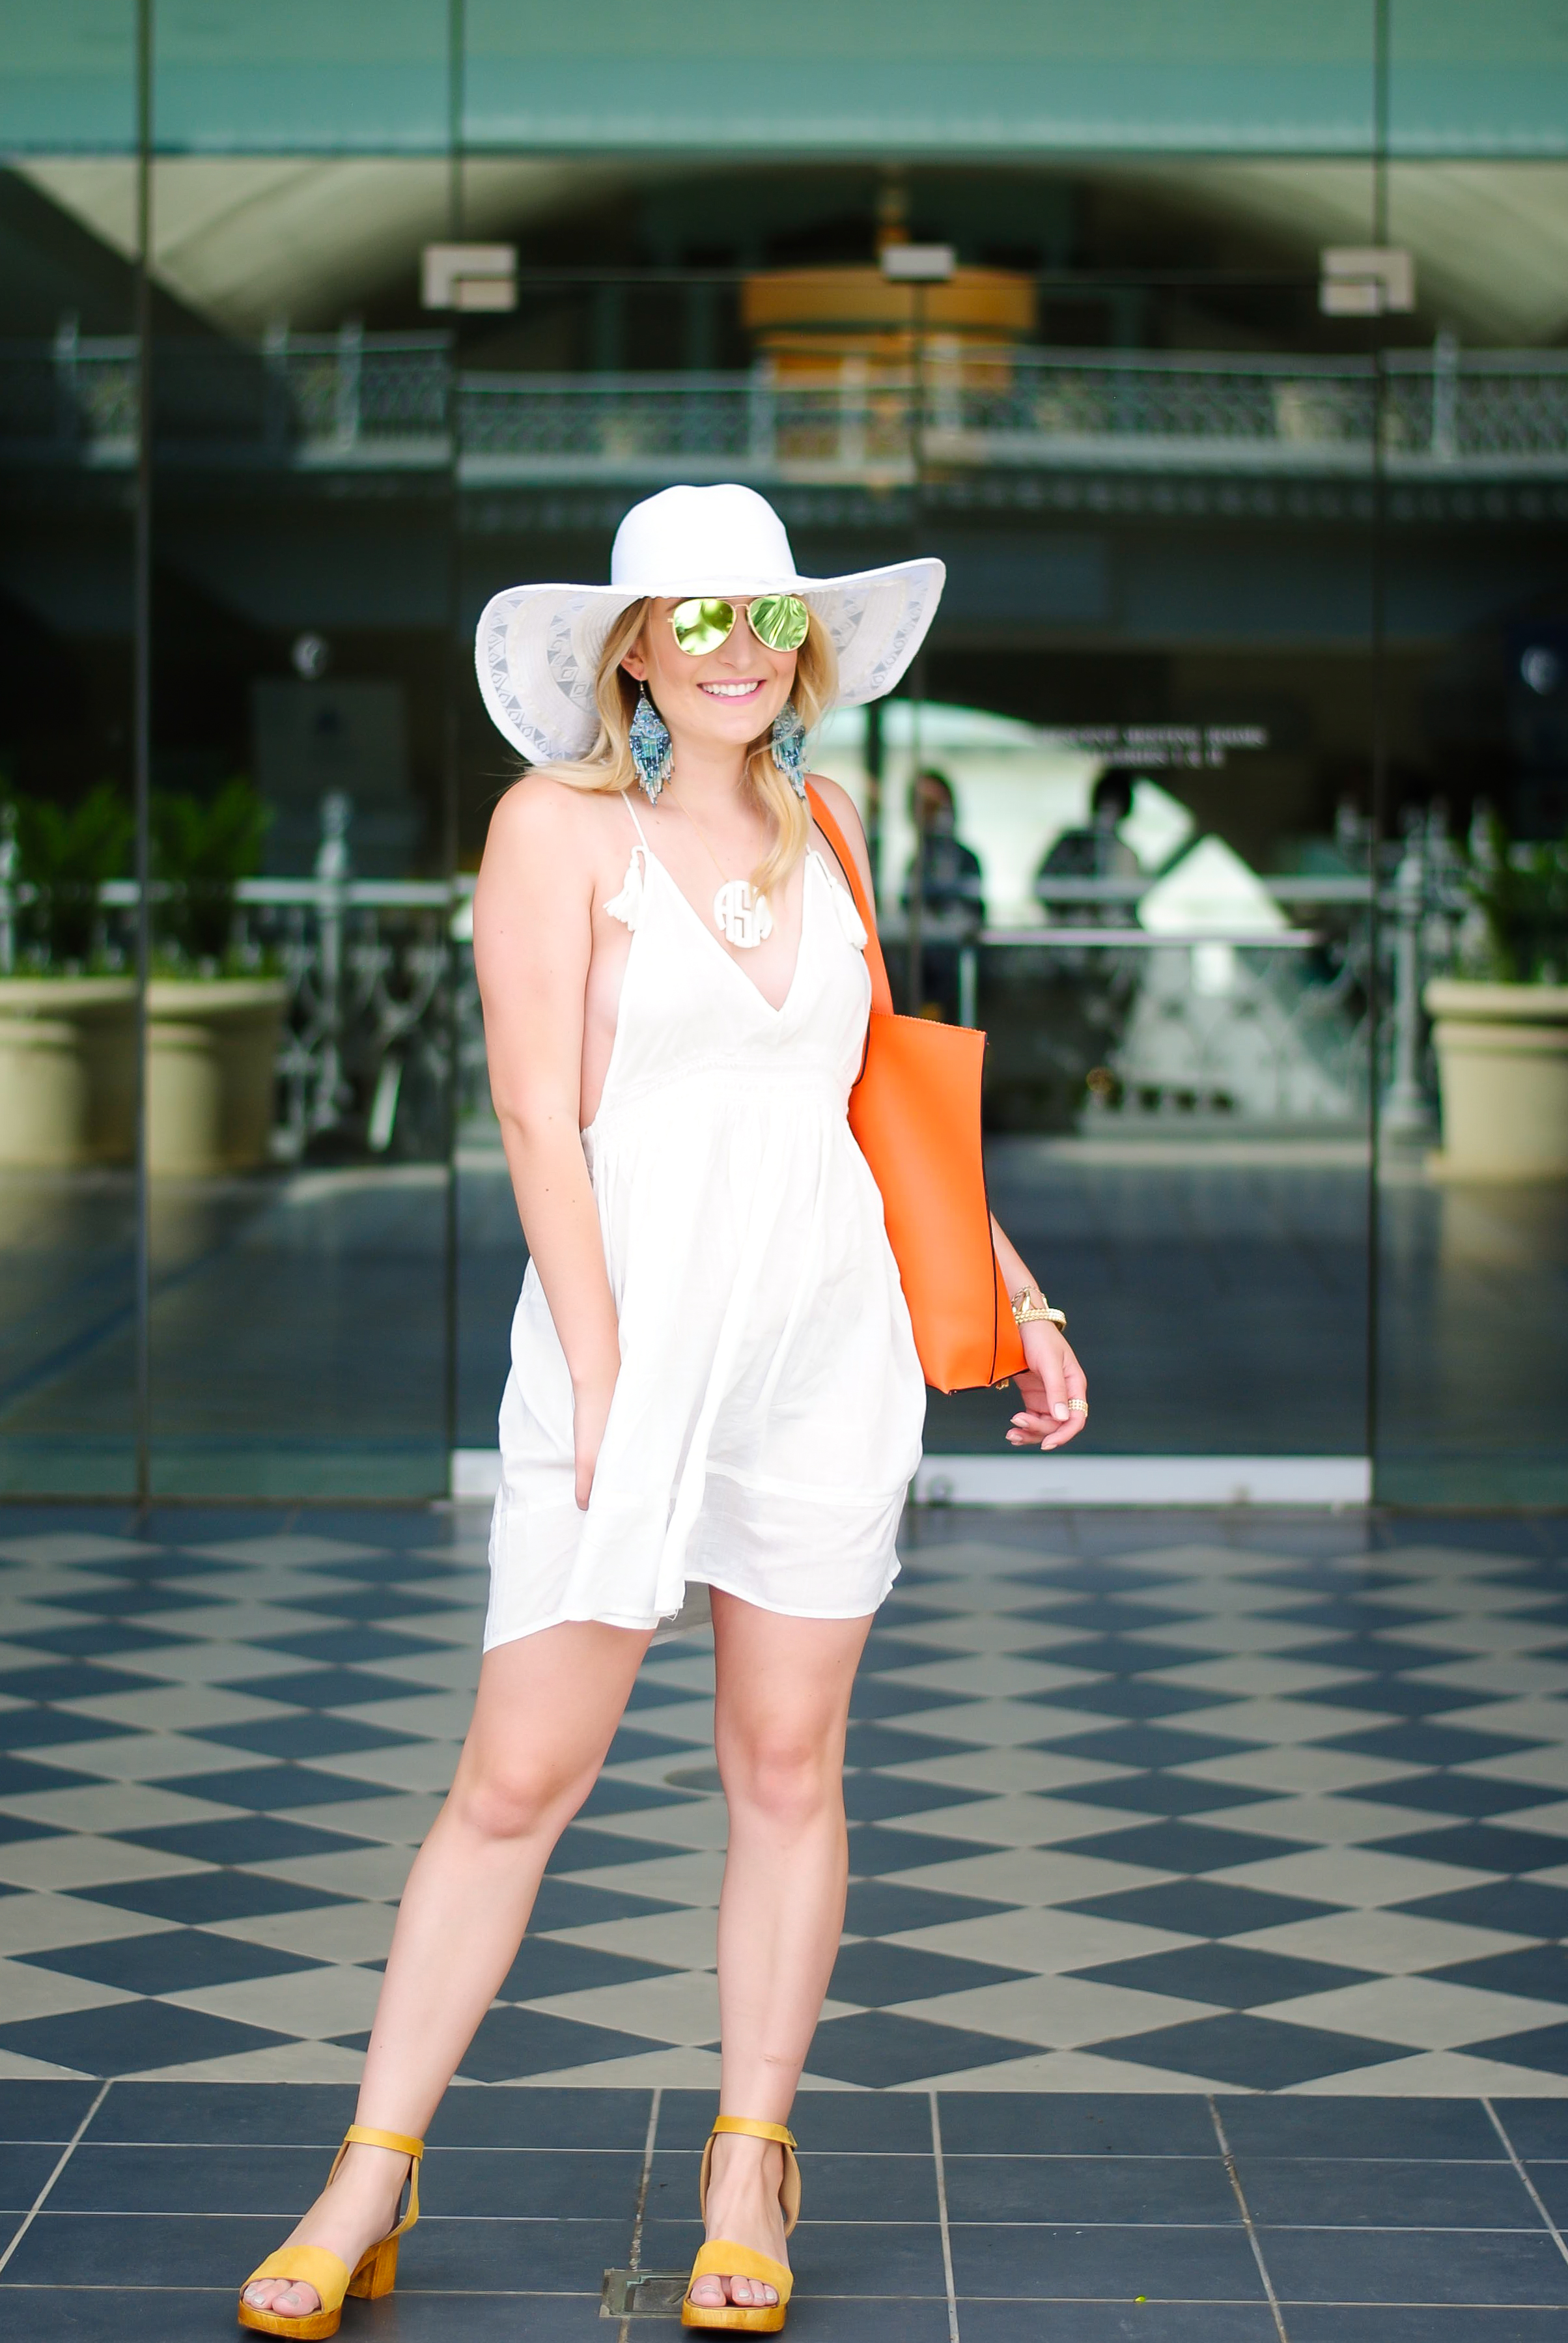 resort vacation | Audrey Madison Stowe Blog